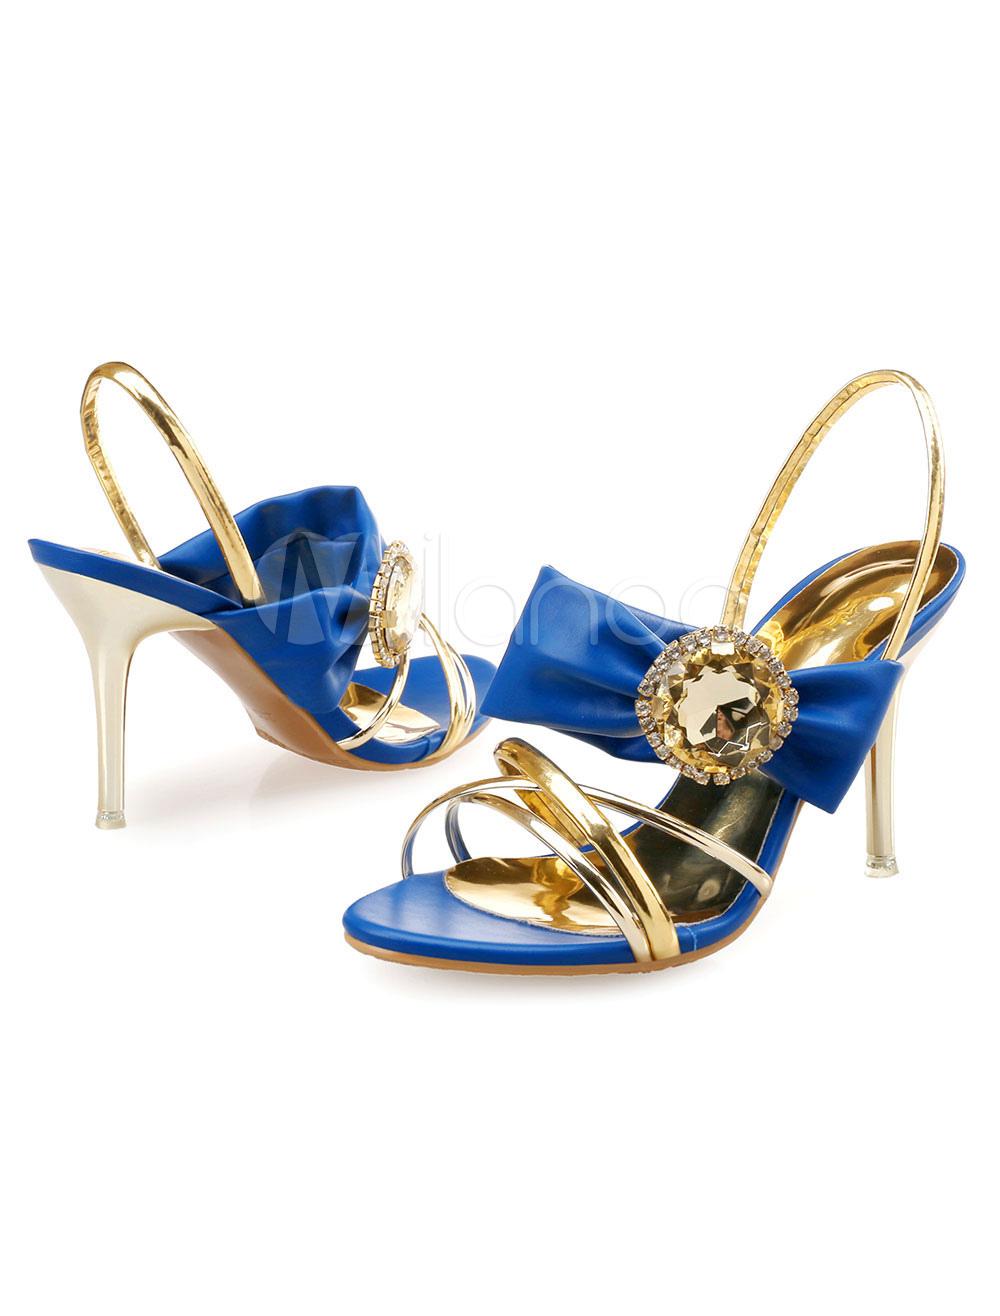 High Heel Dress Sandals Two Tone Rhinestone Bow Stiletto Heel Sandal Shoes For Women